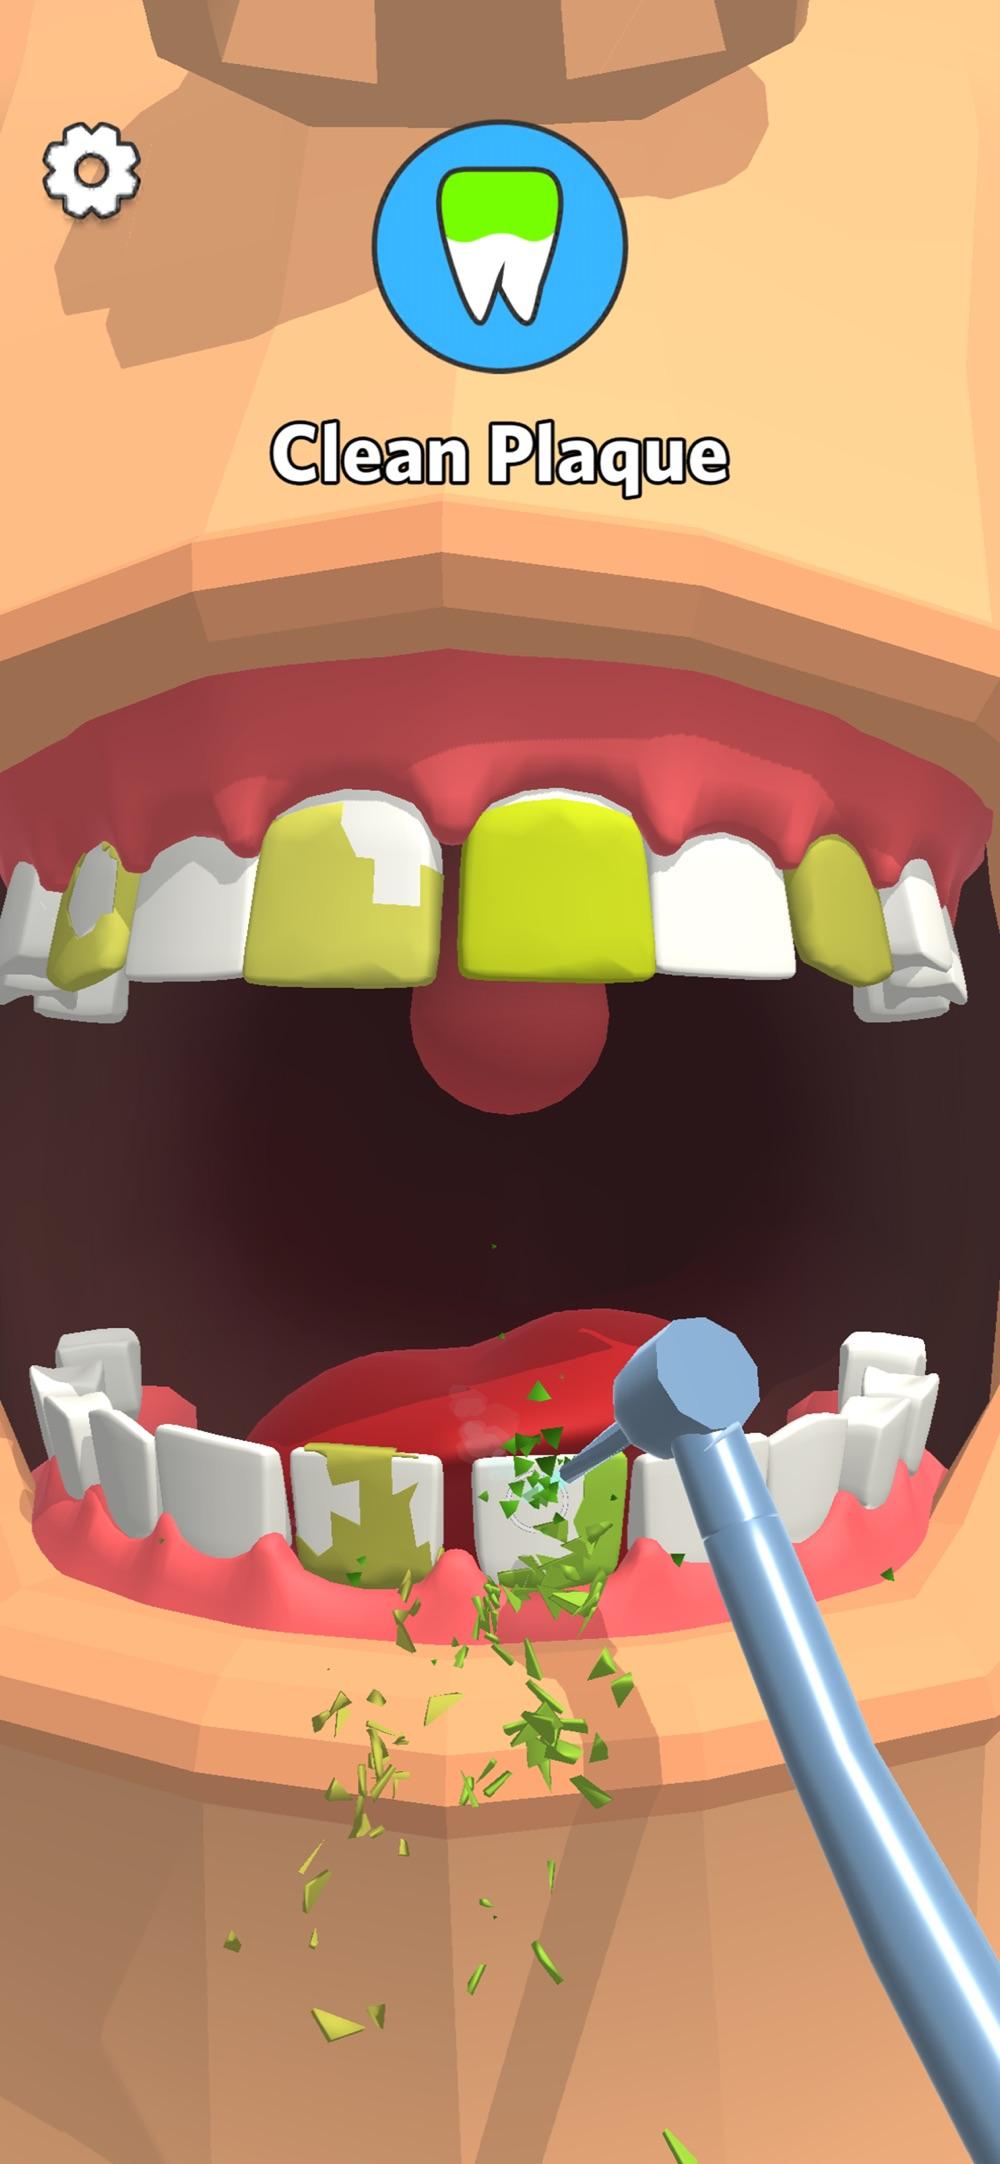 Dentist Bling hack tool